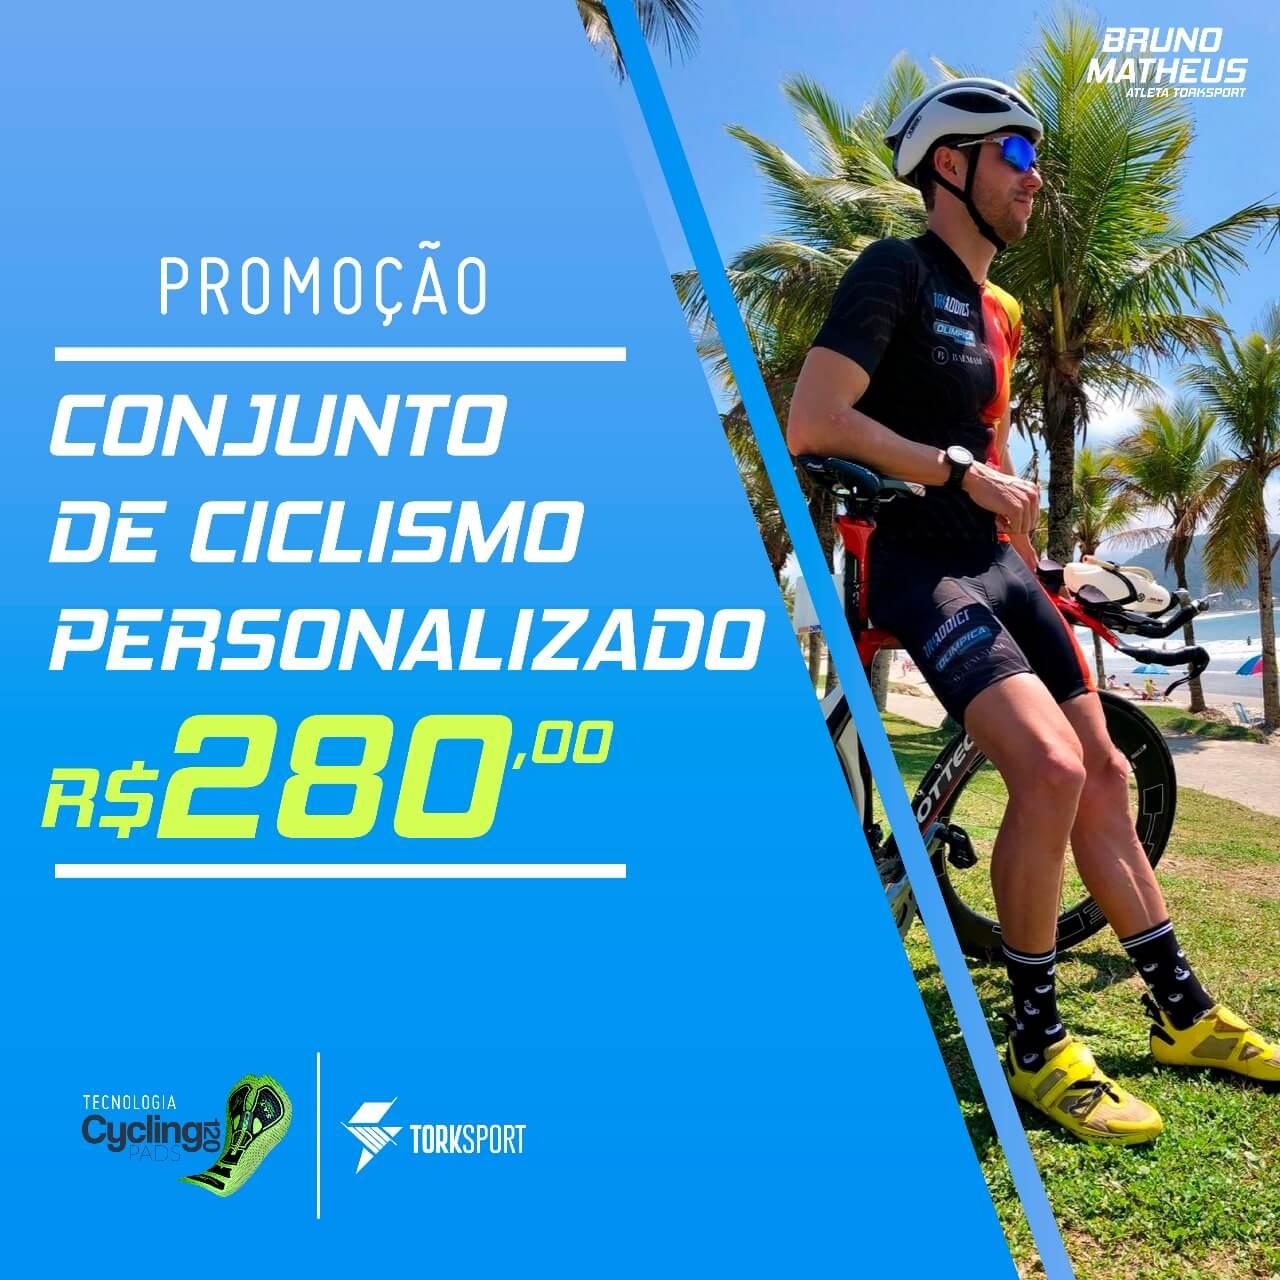 65b1b9ad00 top+triathlon+feminino+euroline+pro+personalizado - Página 4 - Busca ...